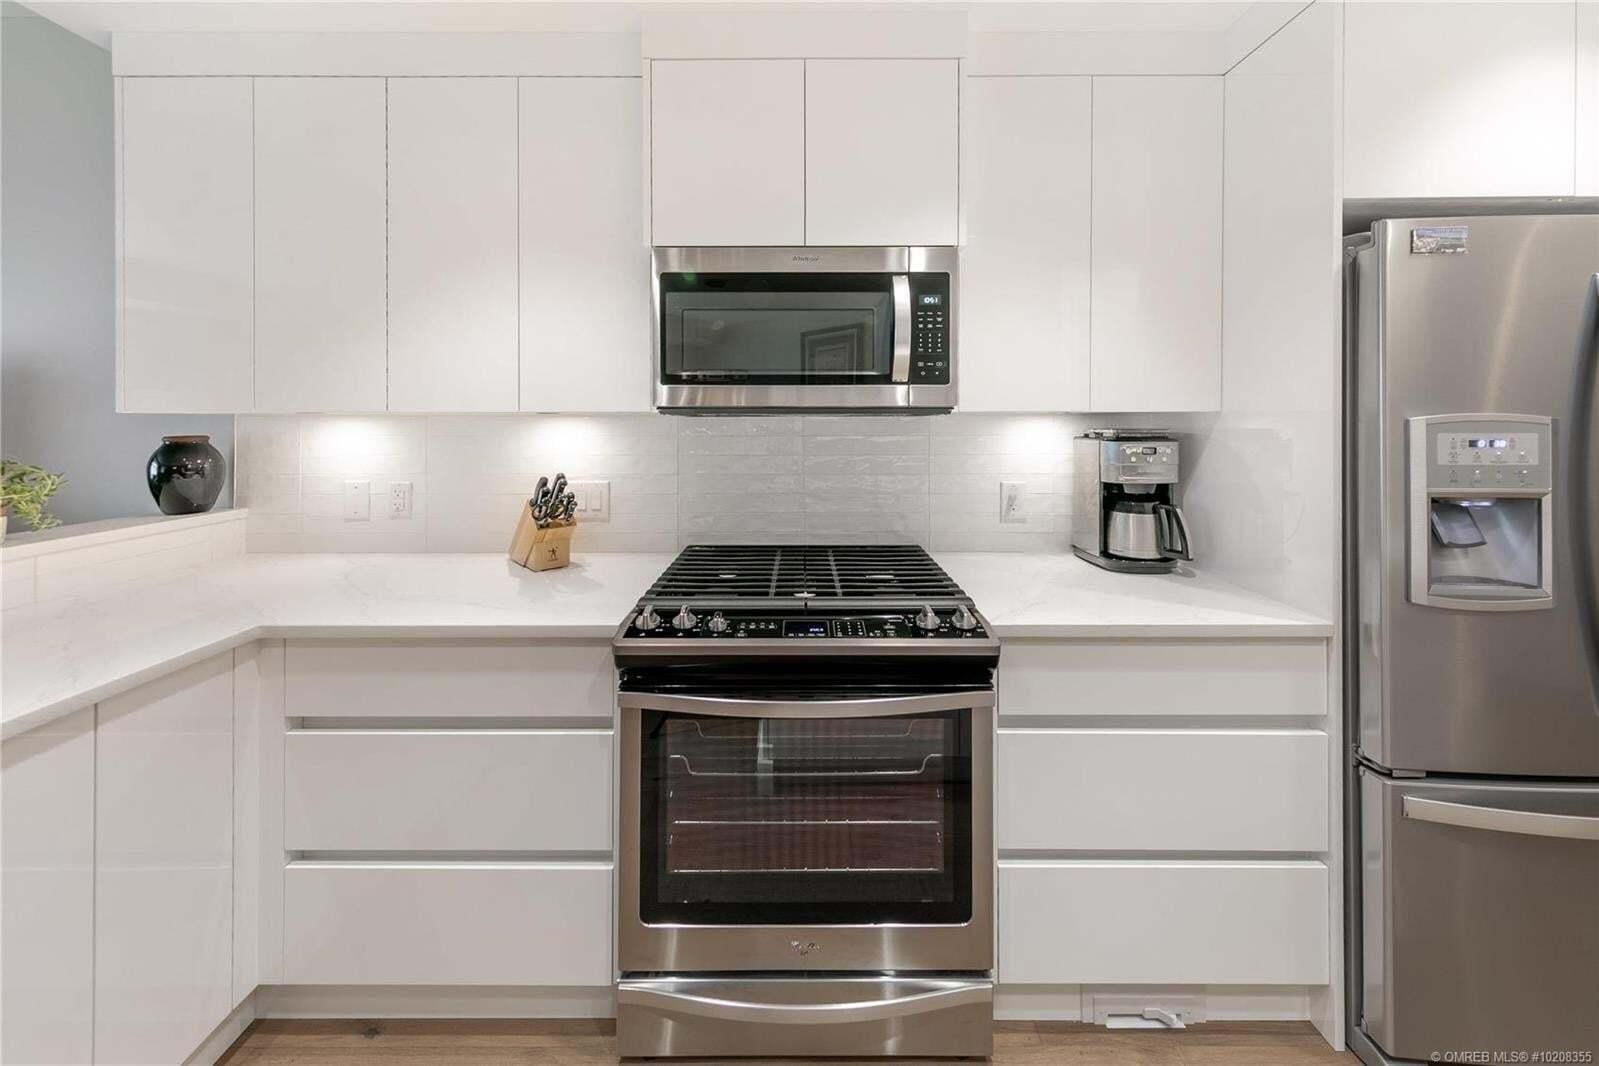 Condo for sale at 3865 Truswell Rd Kelowna British Columbia - MLS: 10208355